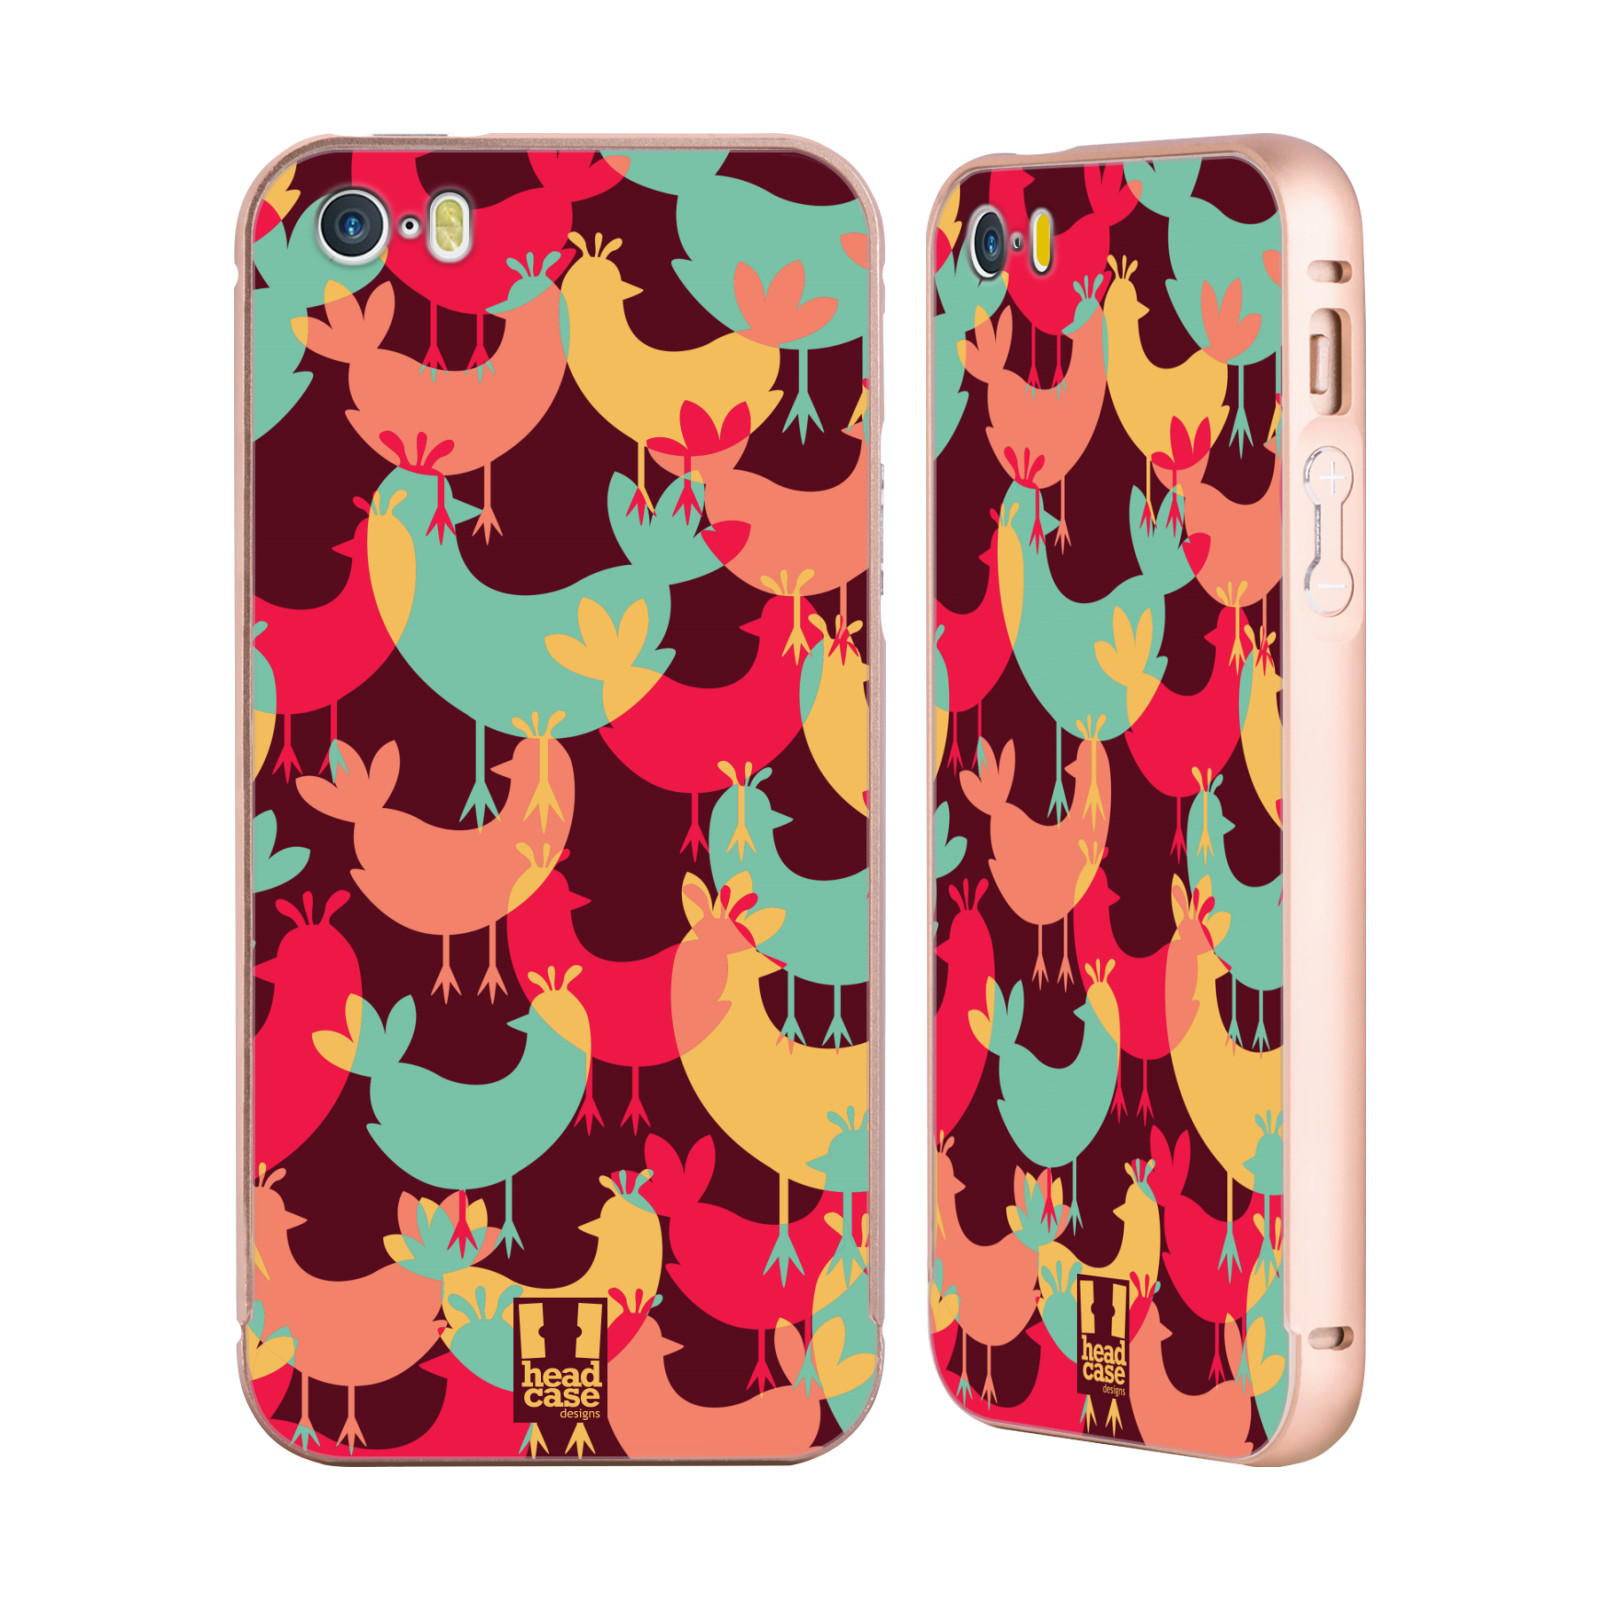 HEAD-CASE-FLOCK-OF-COLOURED-ANIMALS-GOLD-SLIDER-CASE-FOR-APPLE-iPHONE-PHONES